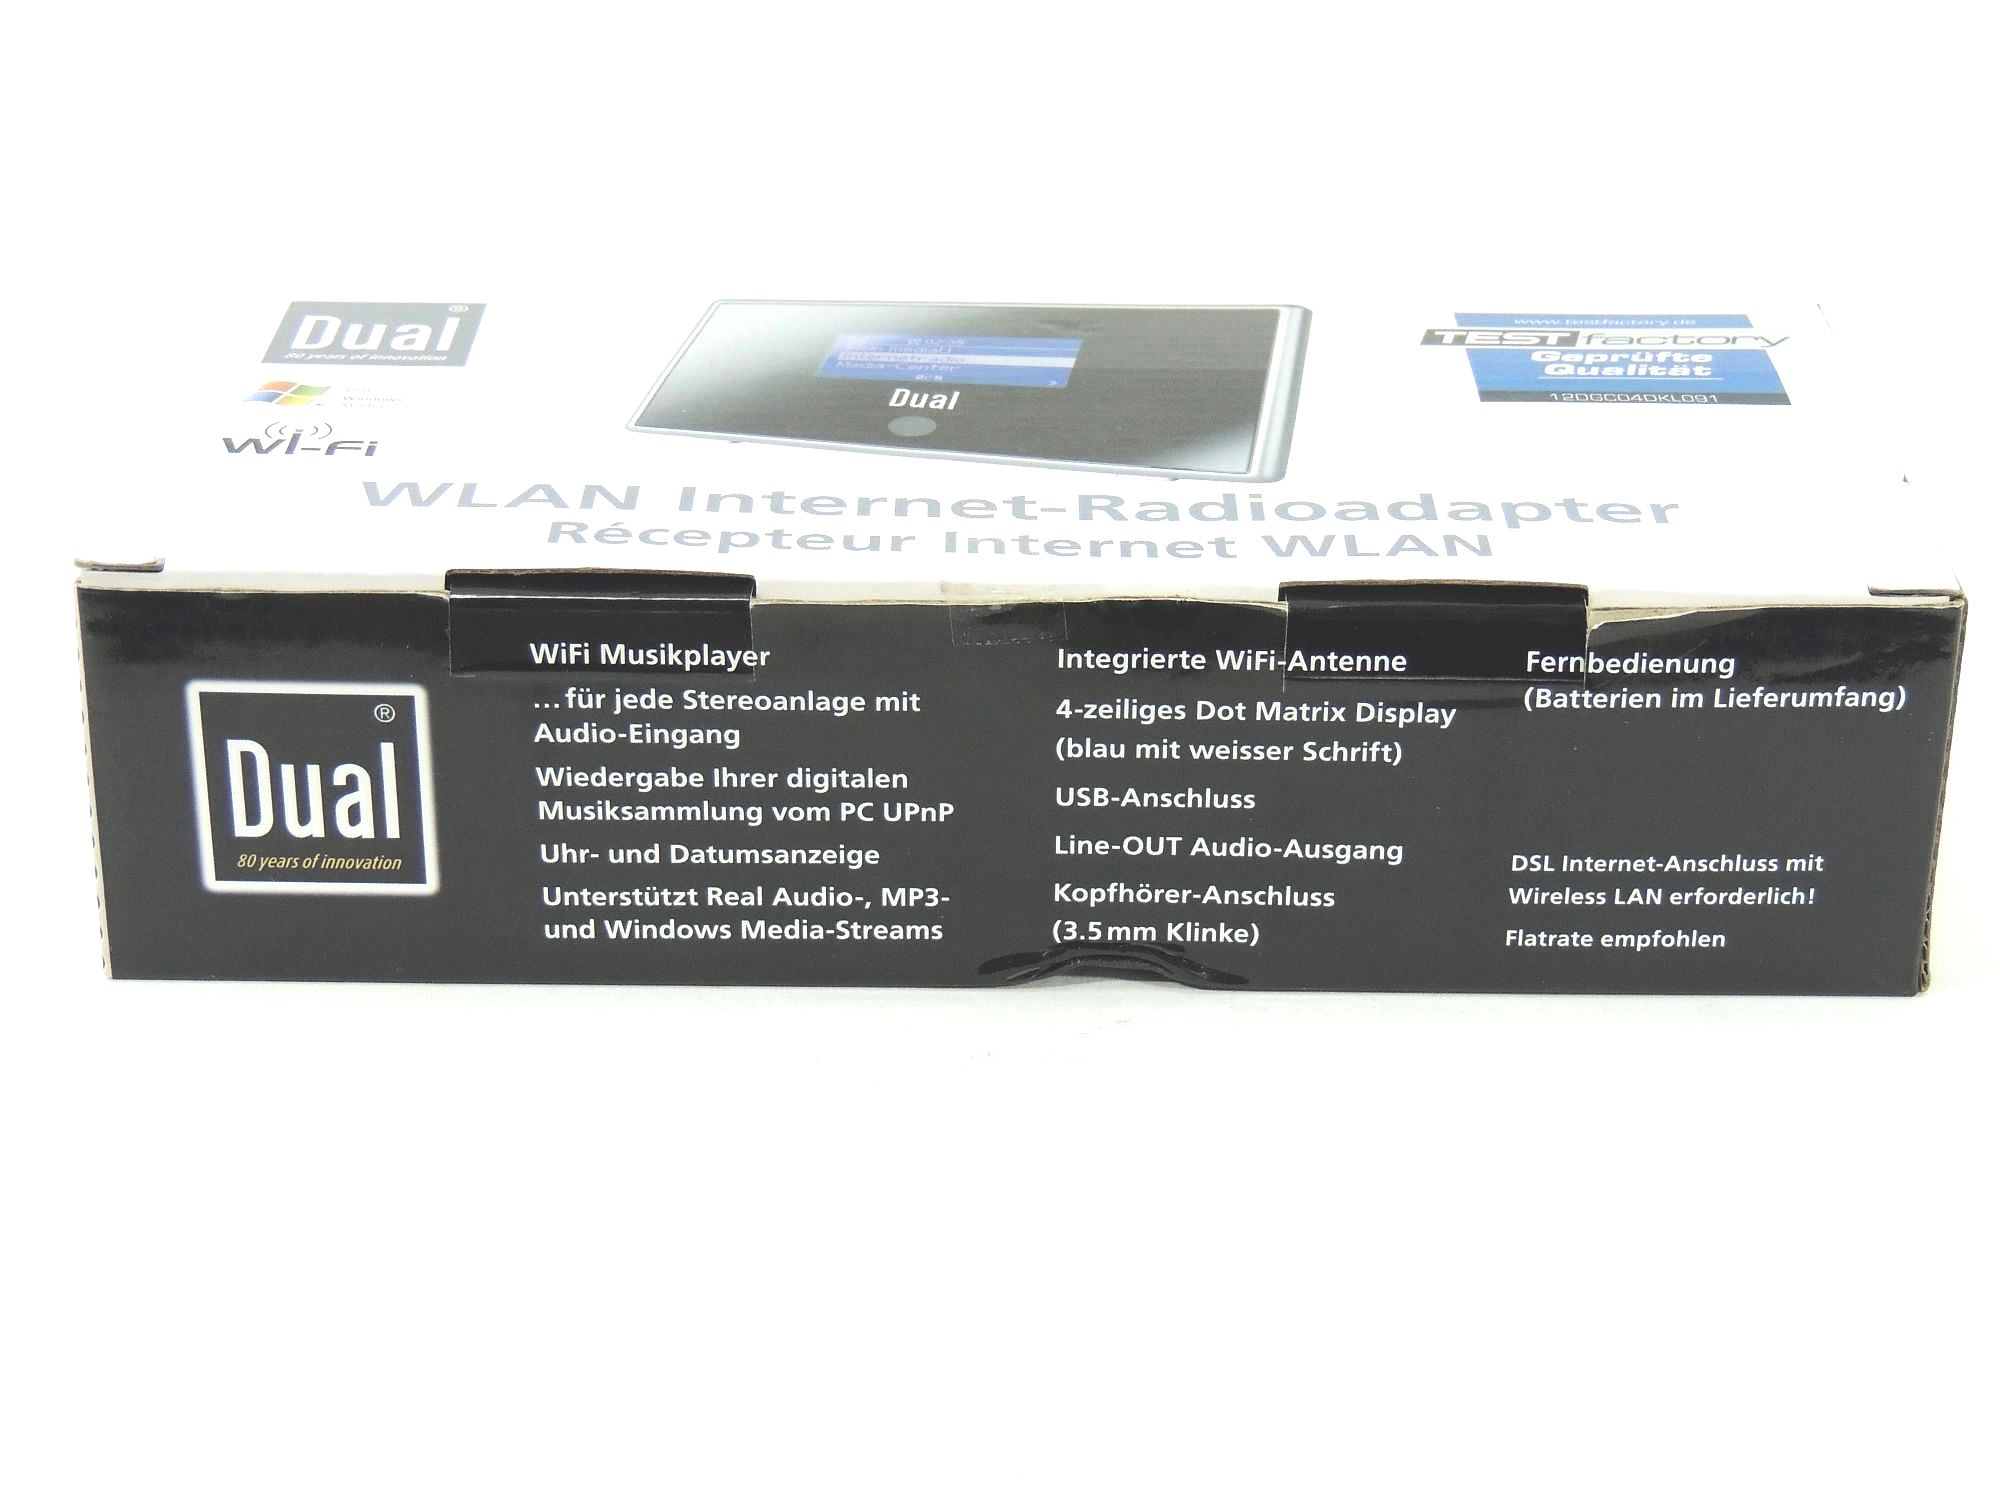 dual ir 1a wlan internetradio adapter silber schwarz ovp b ware ebay. Black Bedroom Furniture Sets. Home Design Ideas